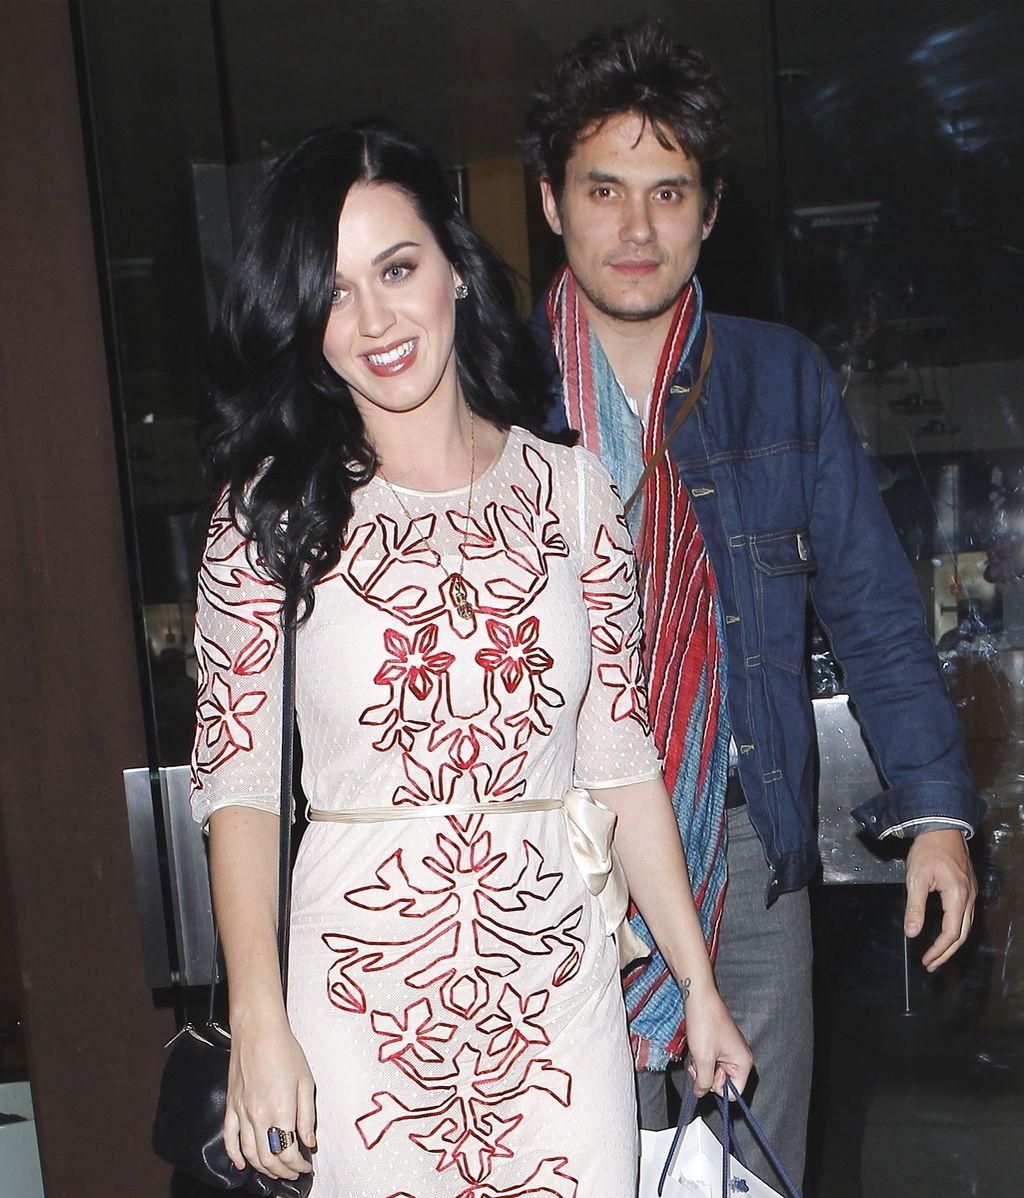 Katy Perry y John Mayer rompen después de ocho meses